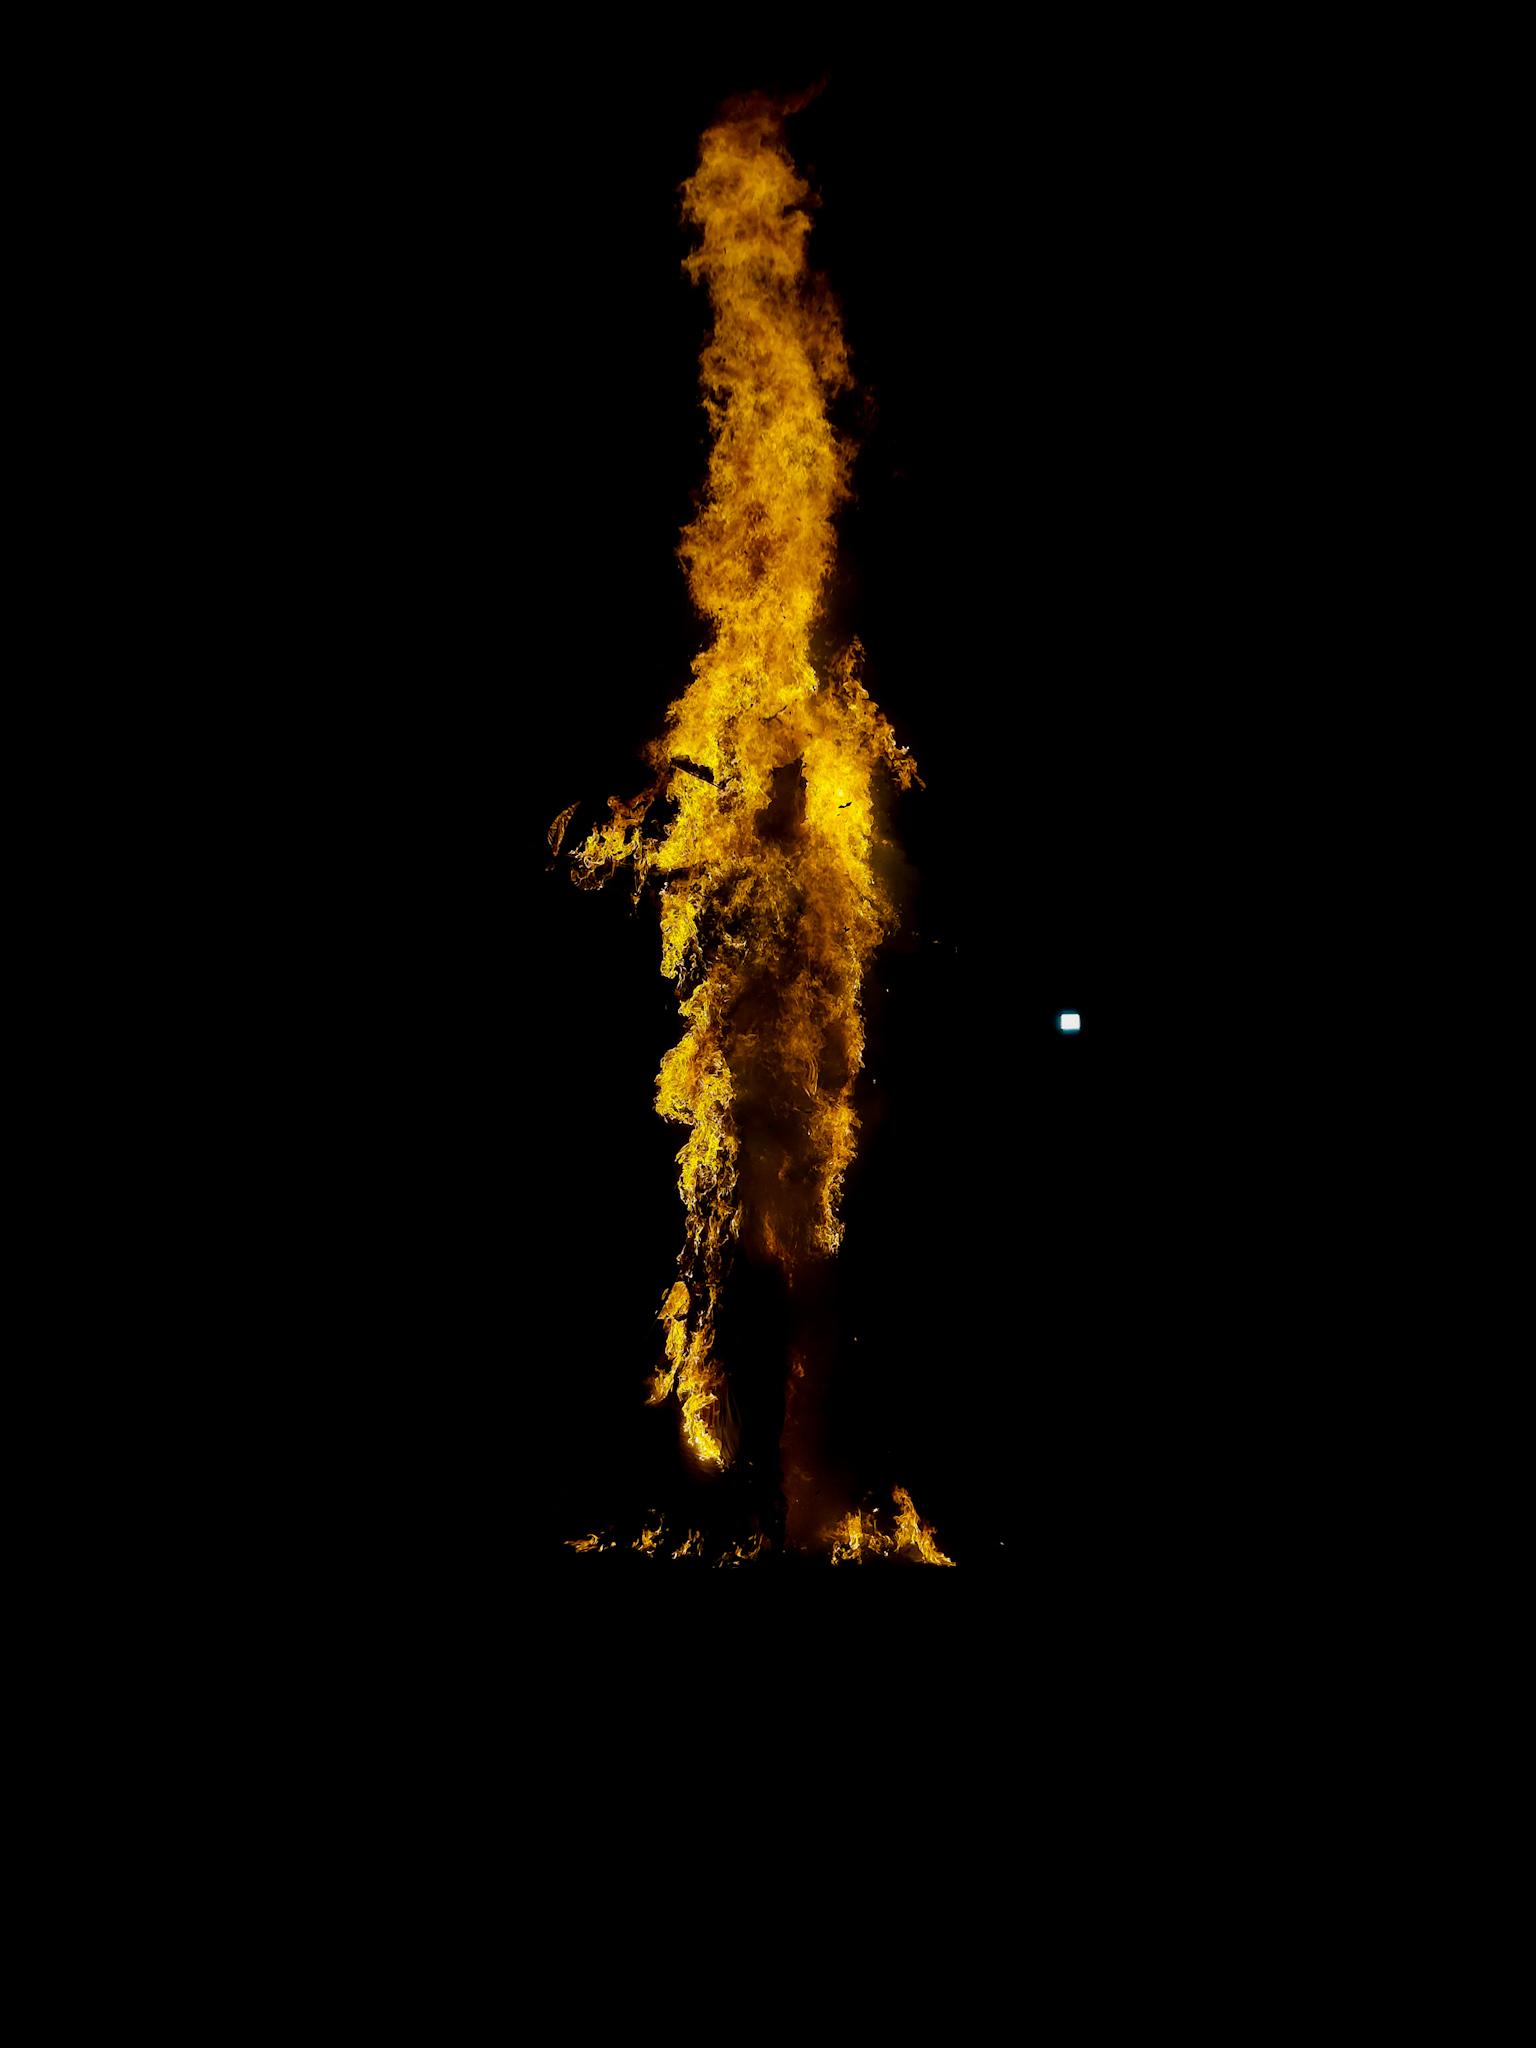 burning ravan effigy